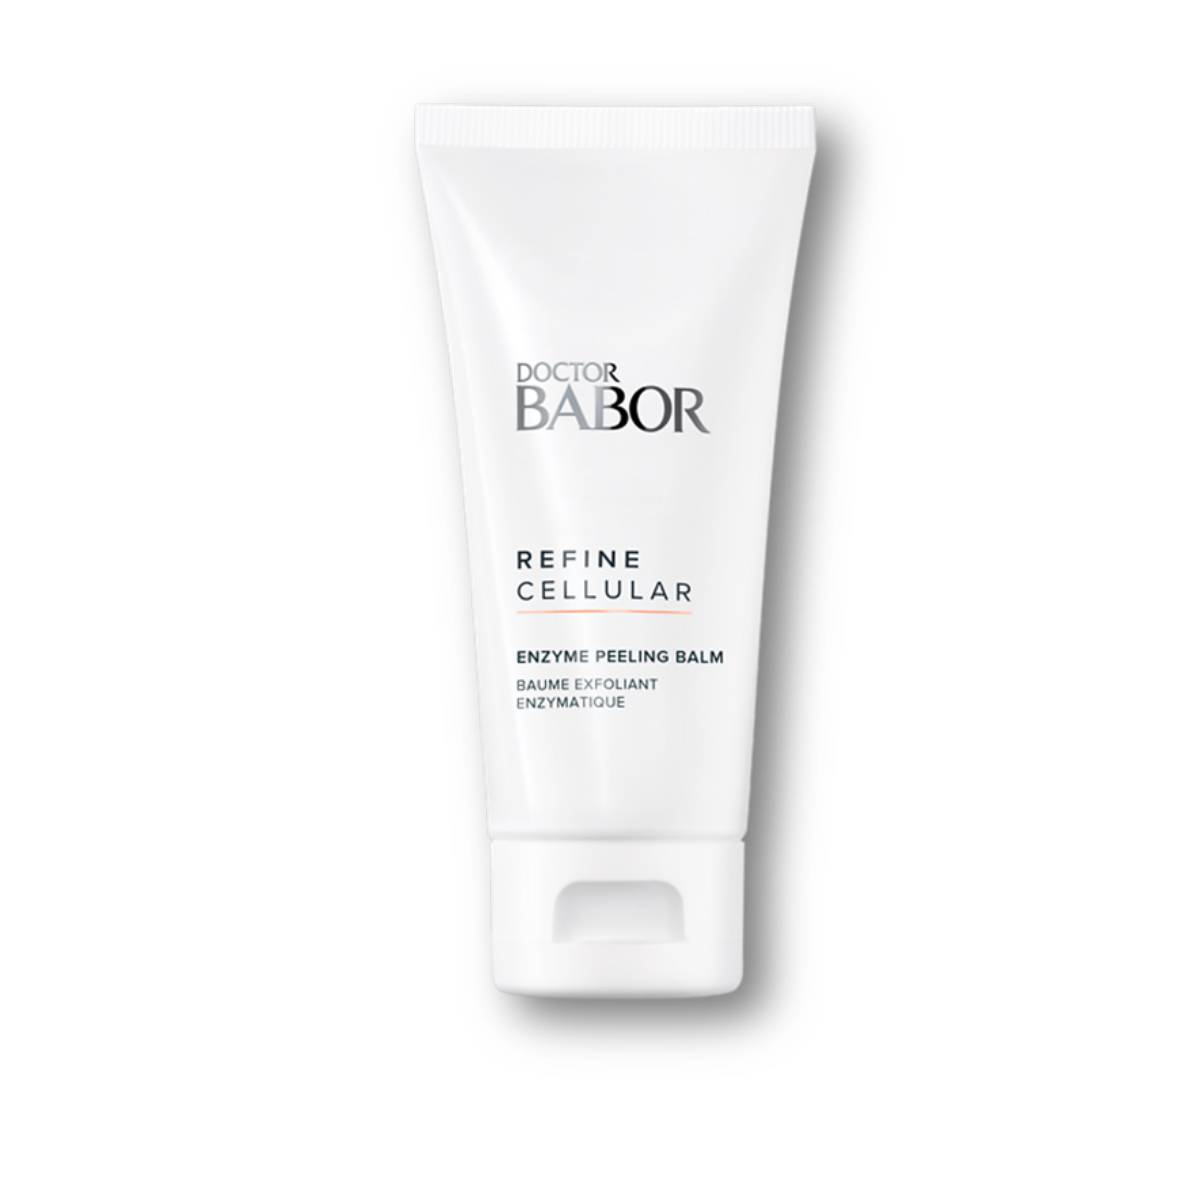 Babor Refine Cellular Enzyme Peel Balm 75ml